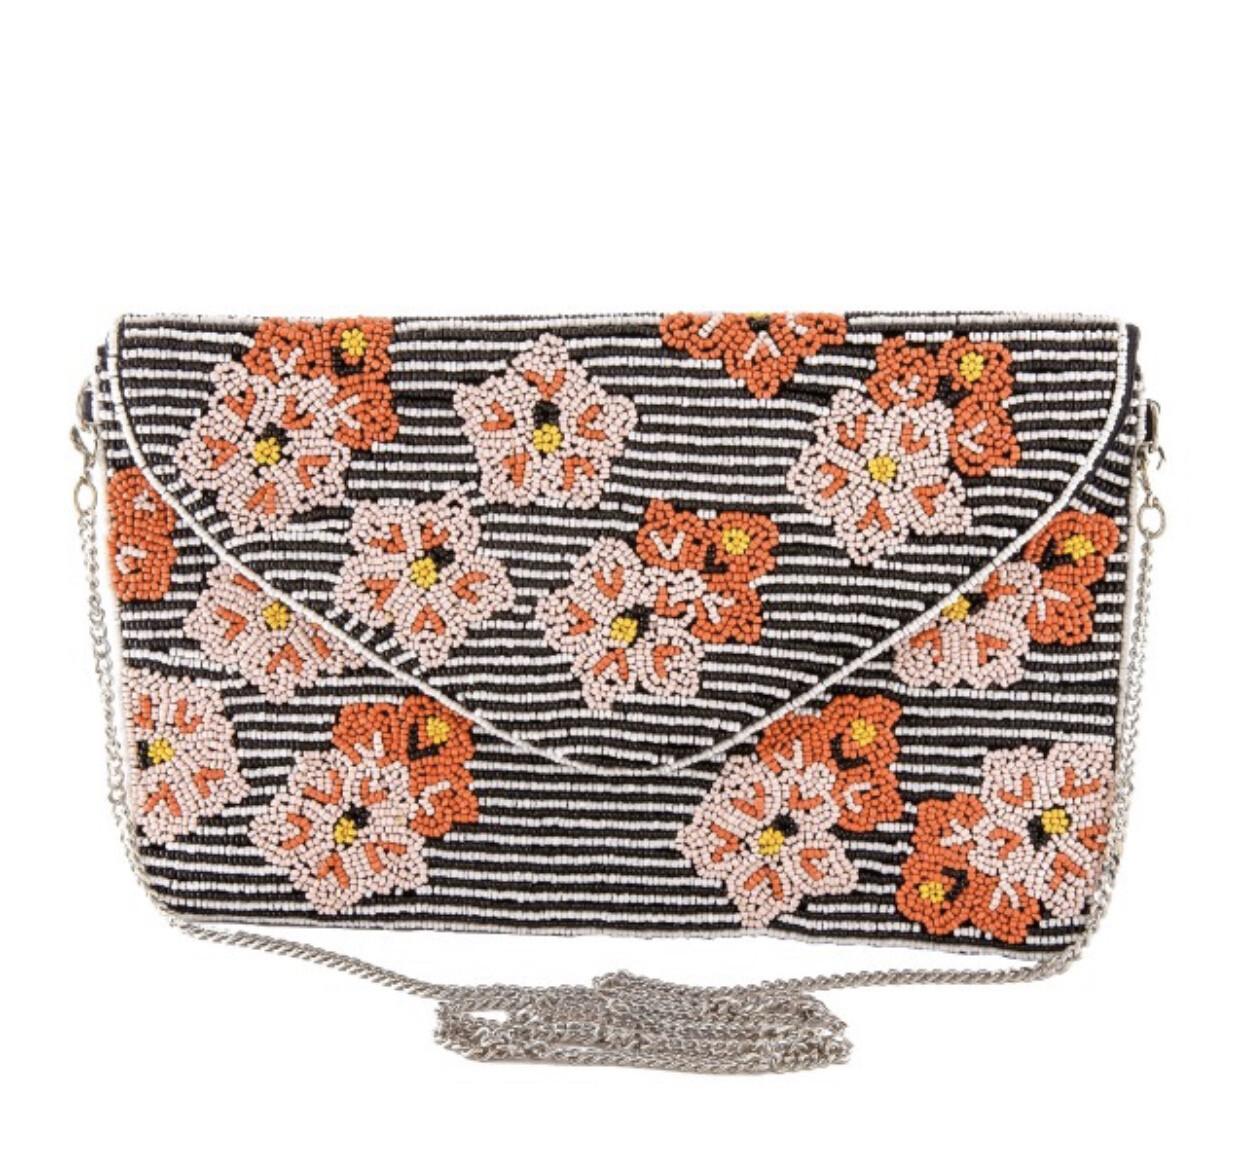 High Quality Black And White Pinstripe Seed Beaded Flower Print Handbag